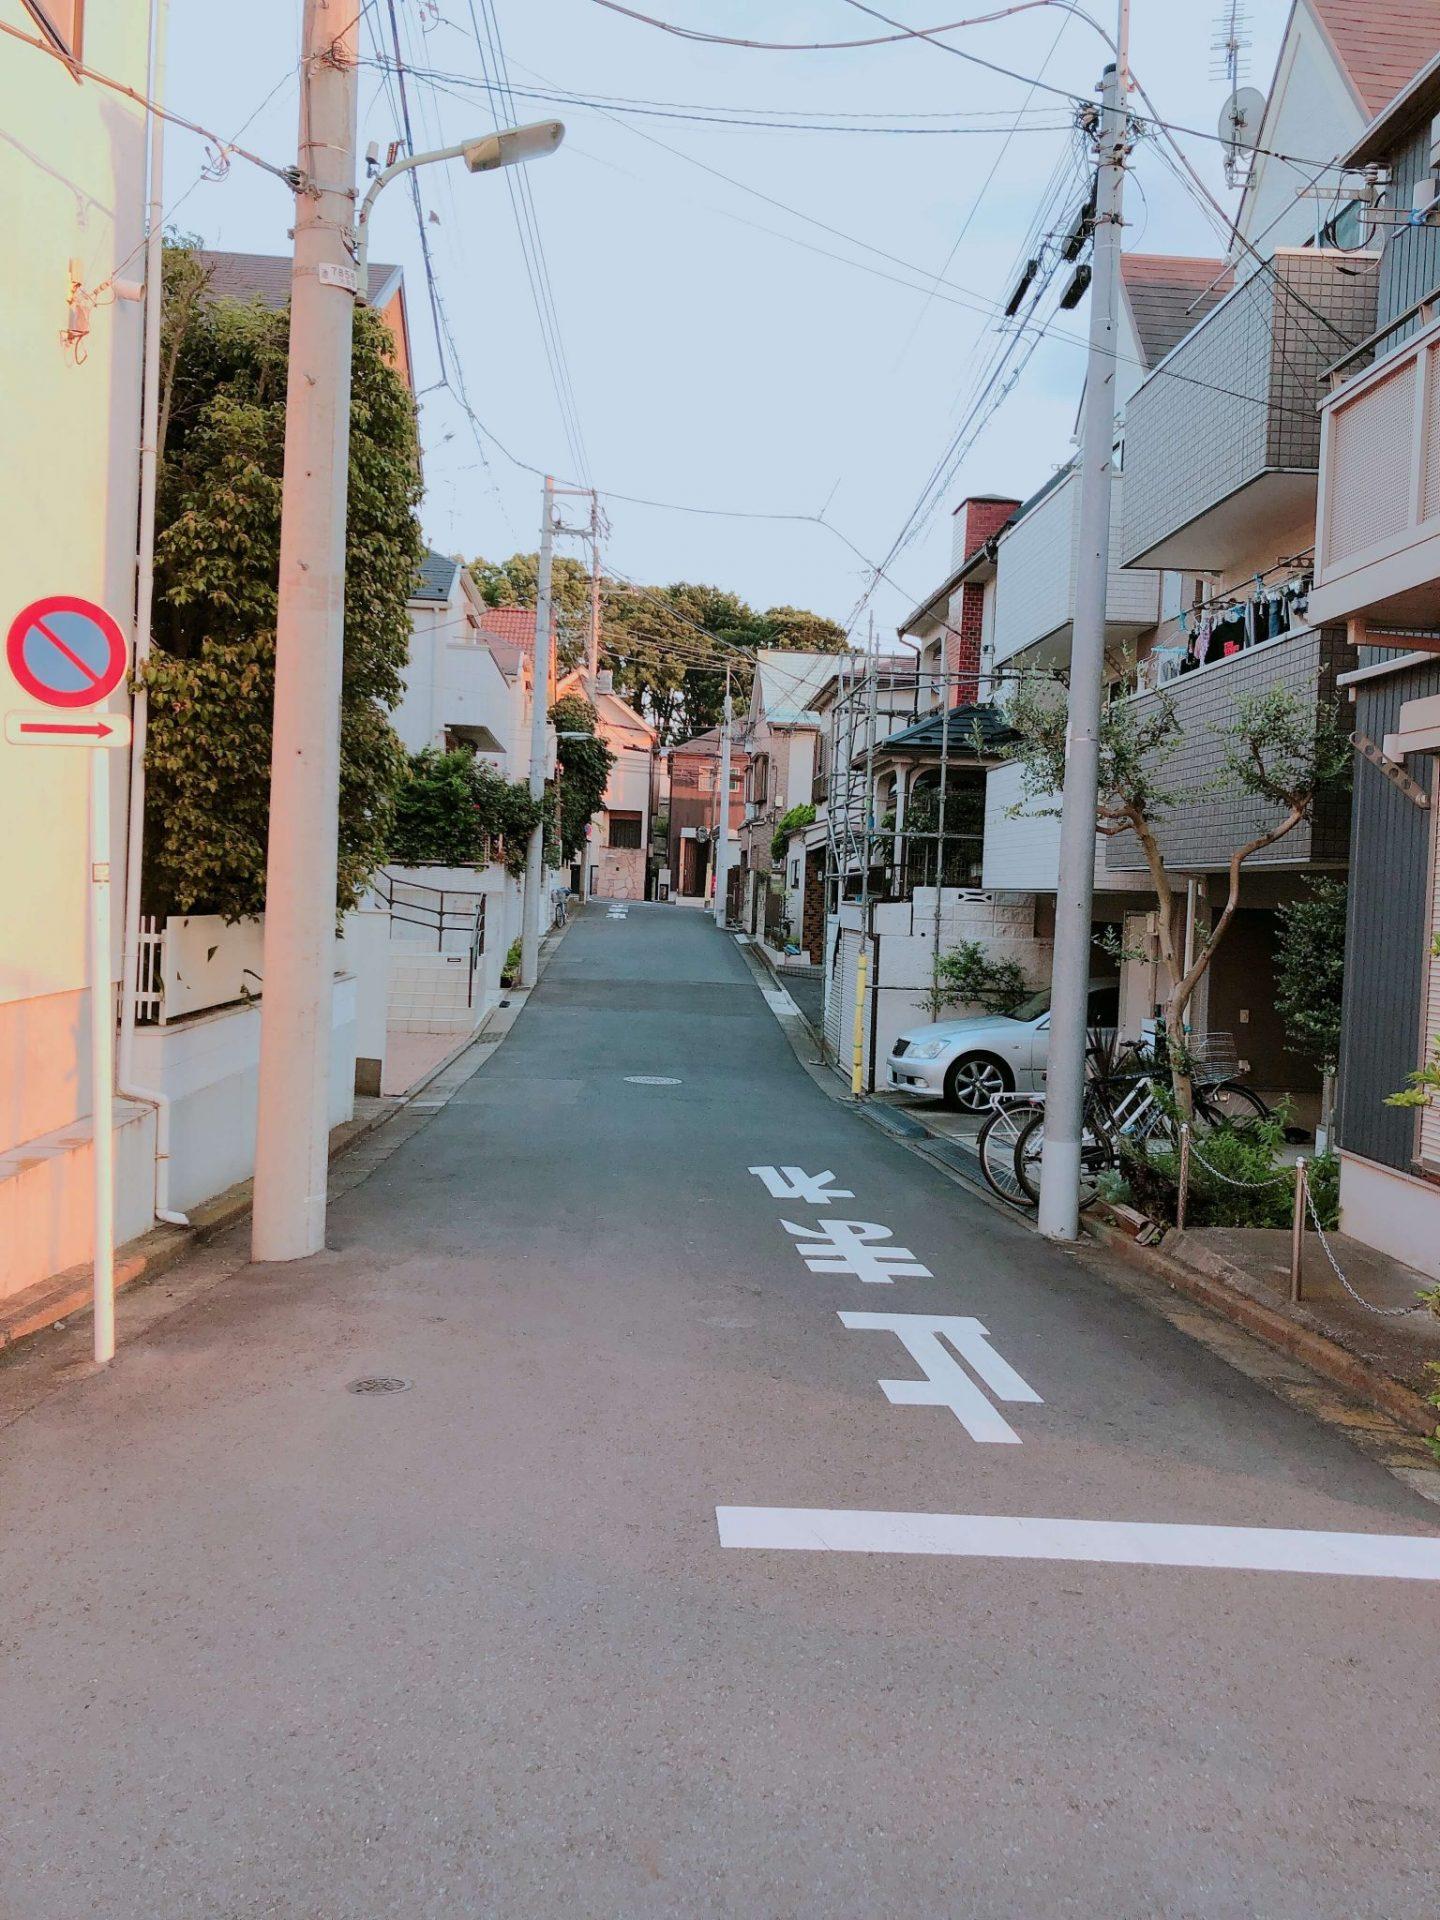 Sunset photo in Japan neighbourhood